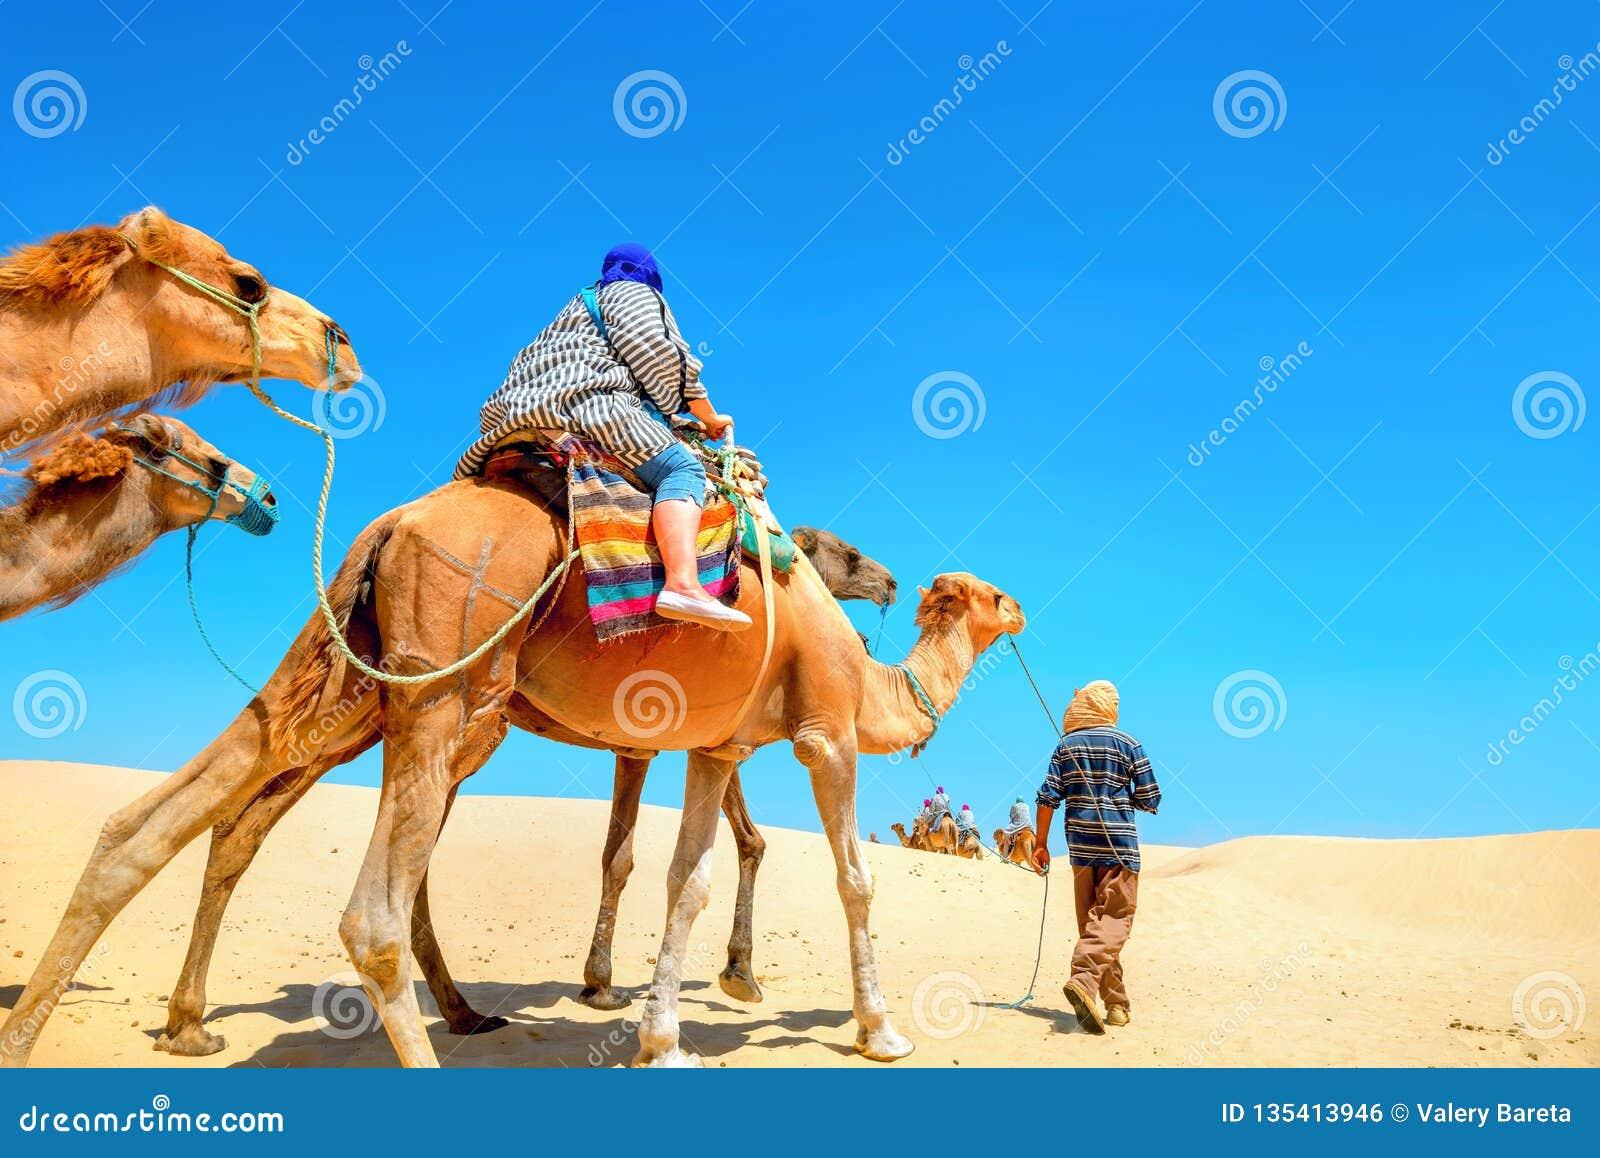 Safari tourism on camels. Sahara desert, Tunisia, North Africa